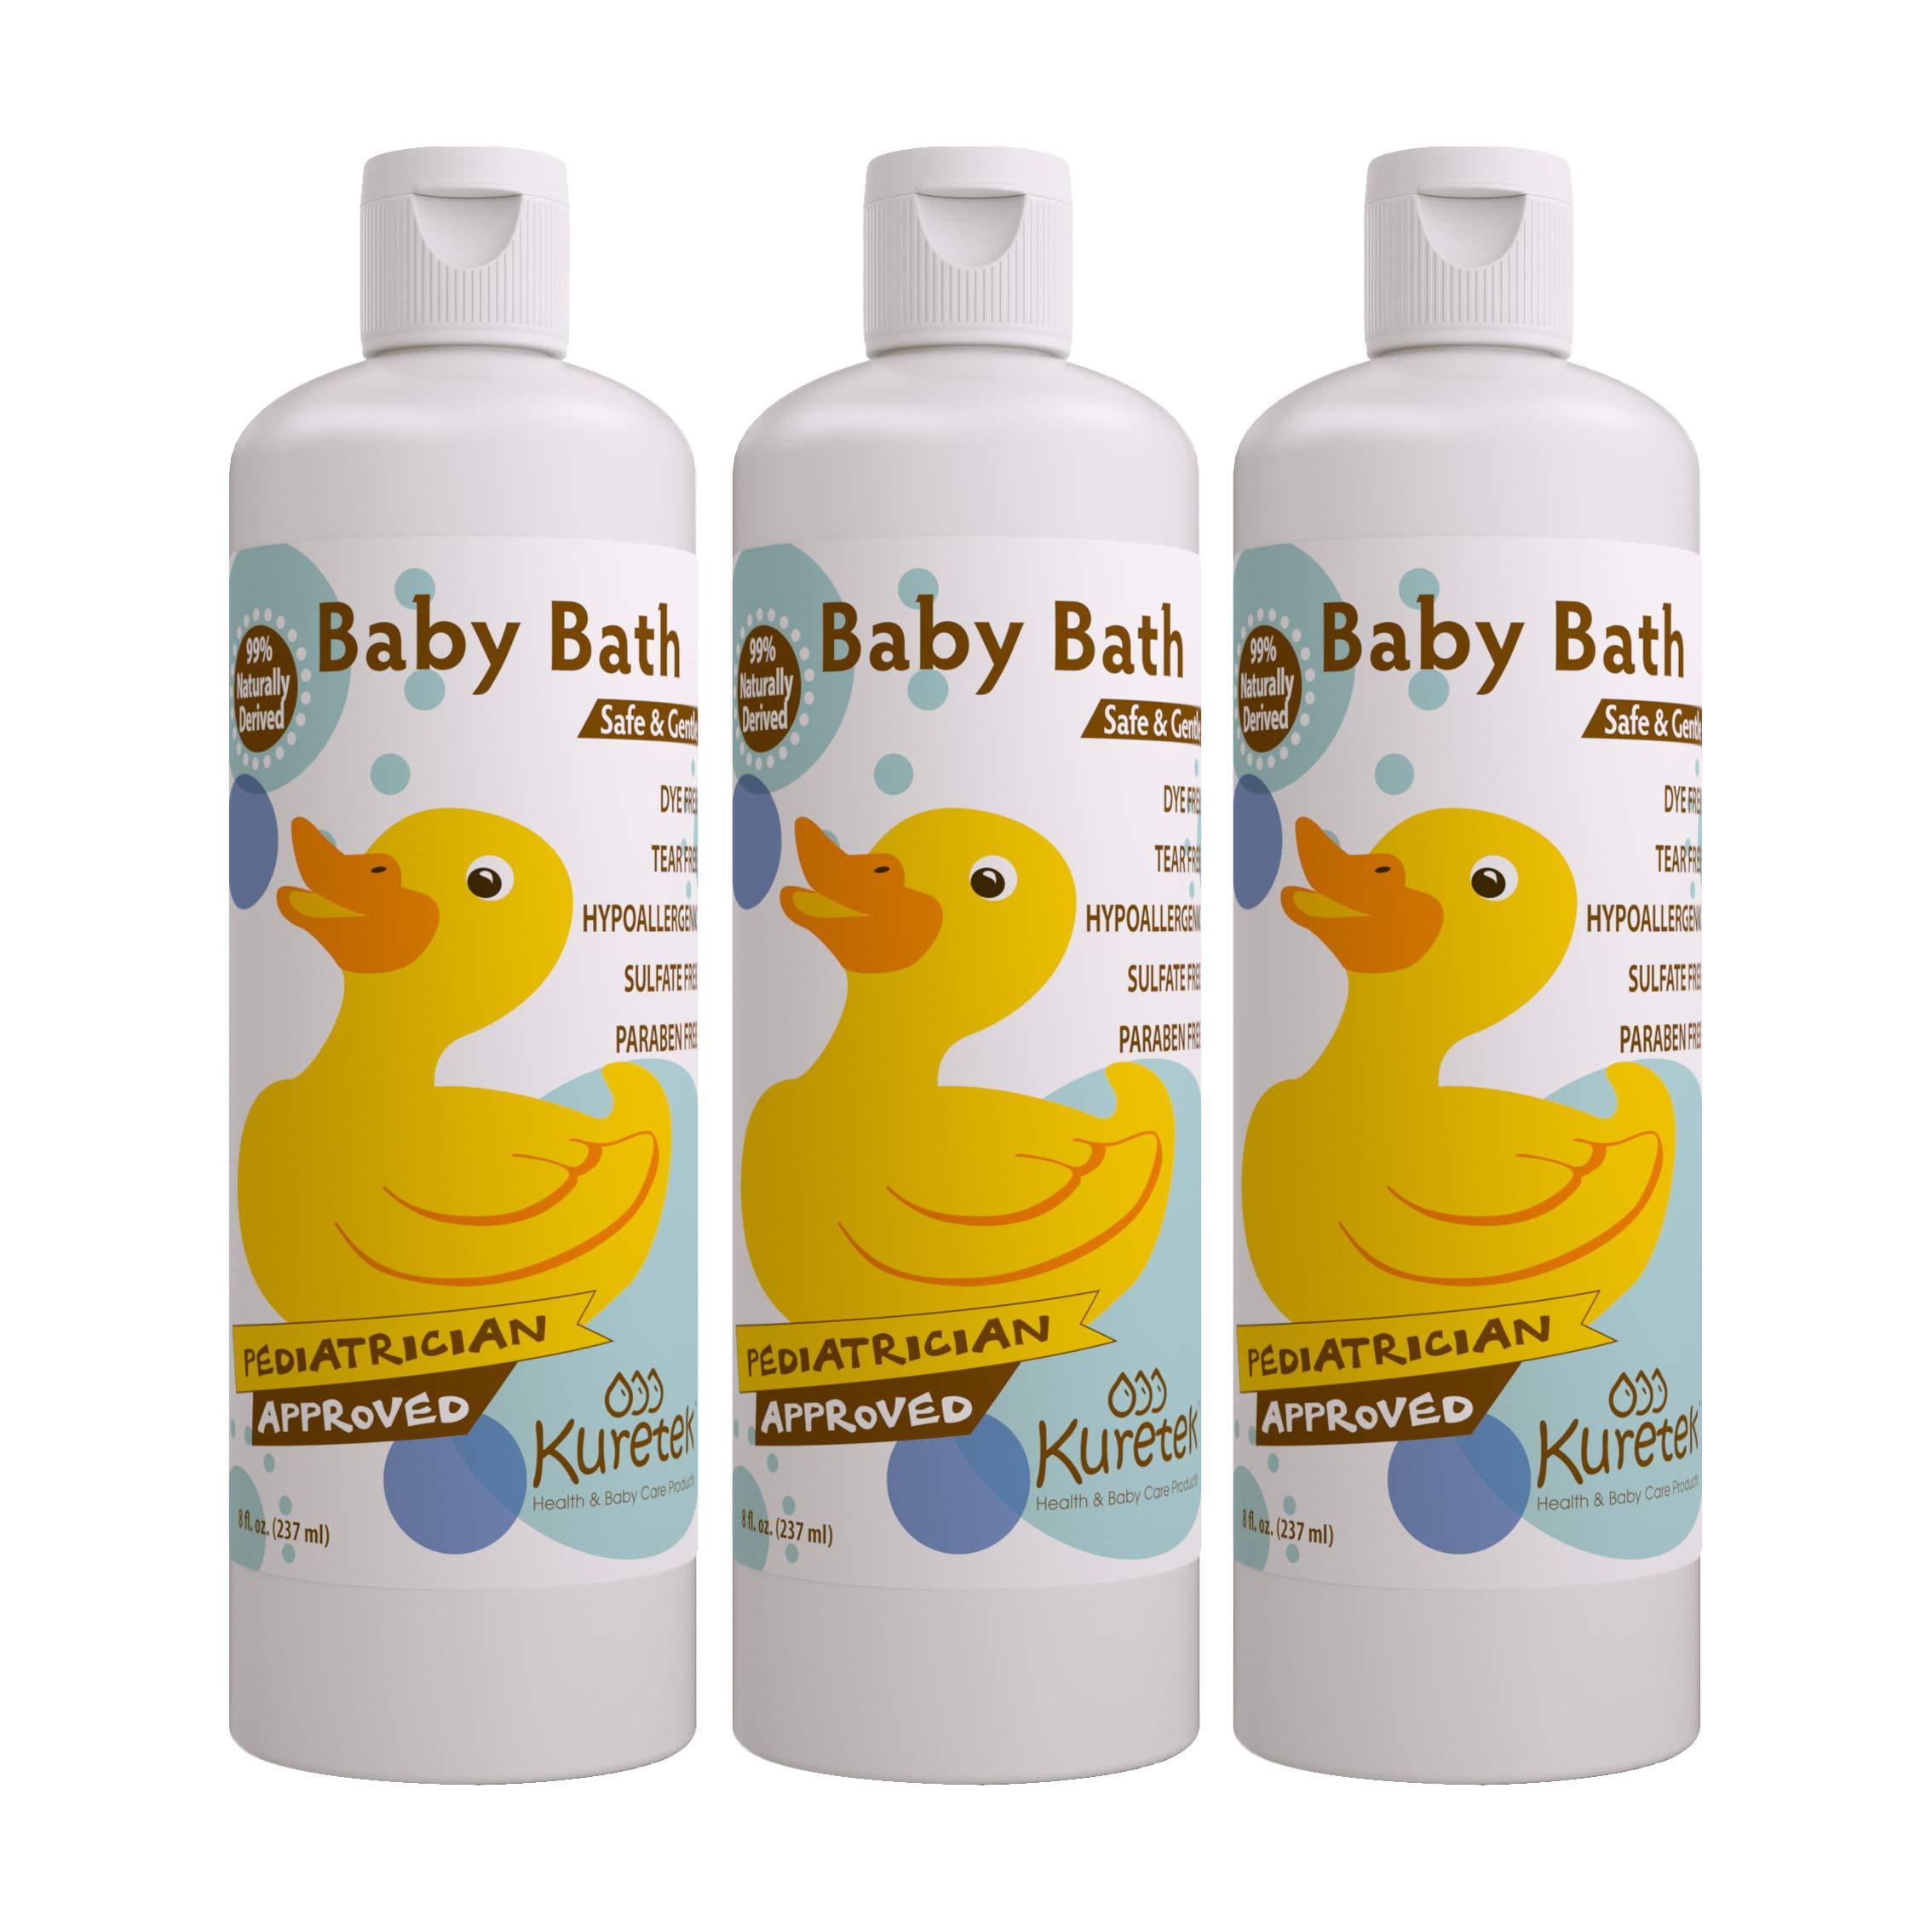 Kuretek Safe & Gentle Baby Bath, Pediatrician Approved, Hypoallergenic, Tear-Free, 8 ounces (3-pack) by Kuretek